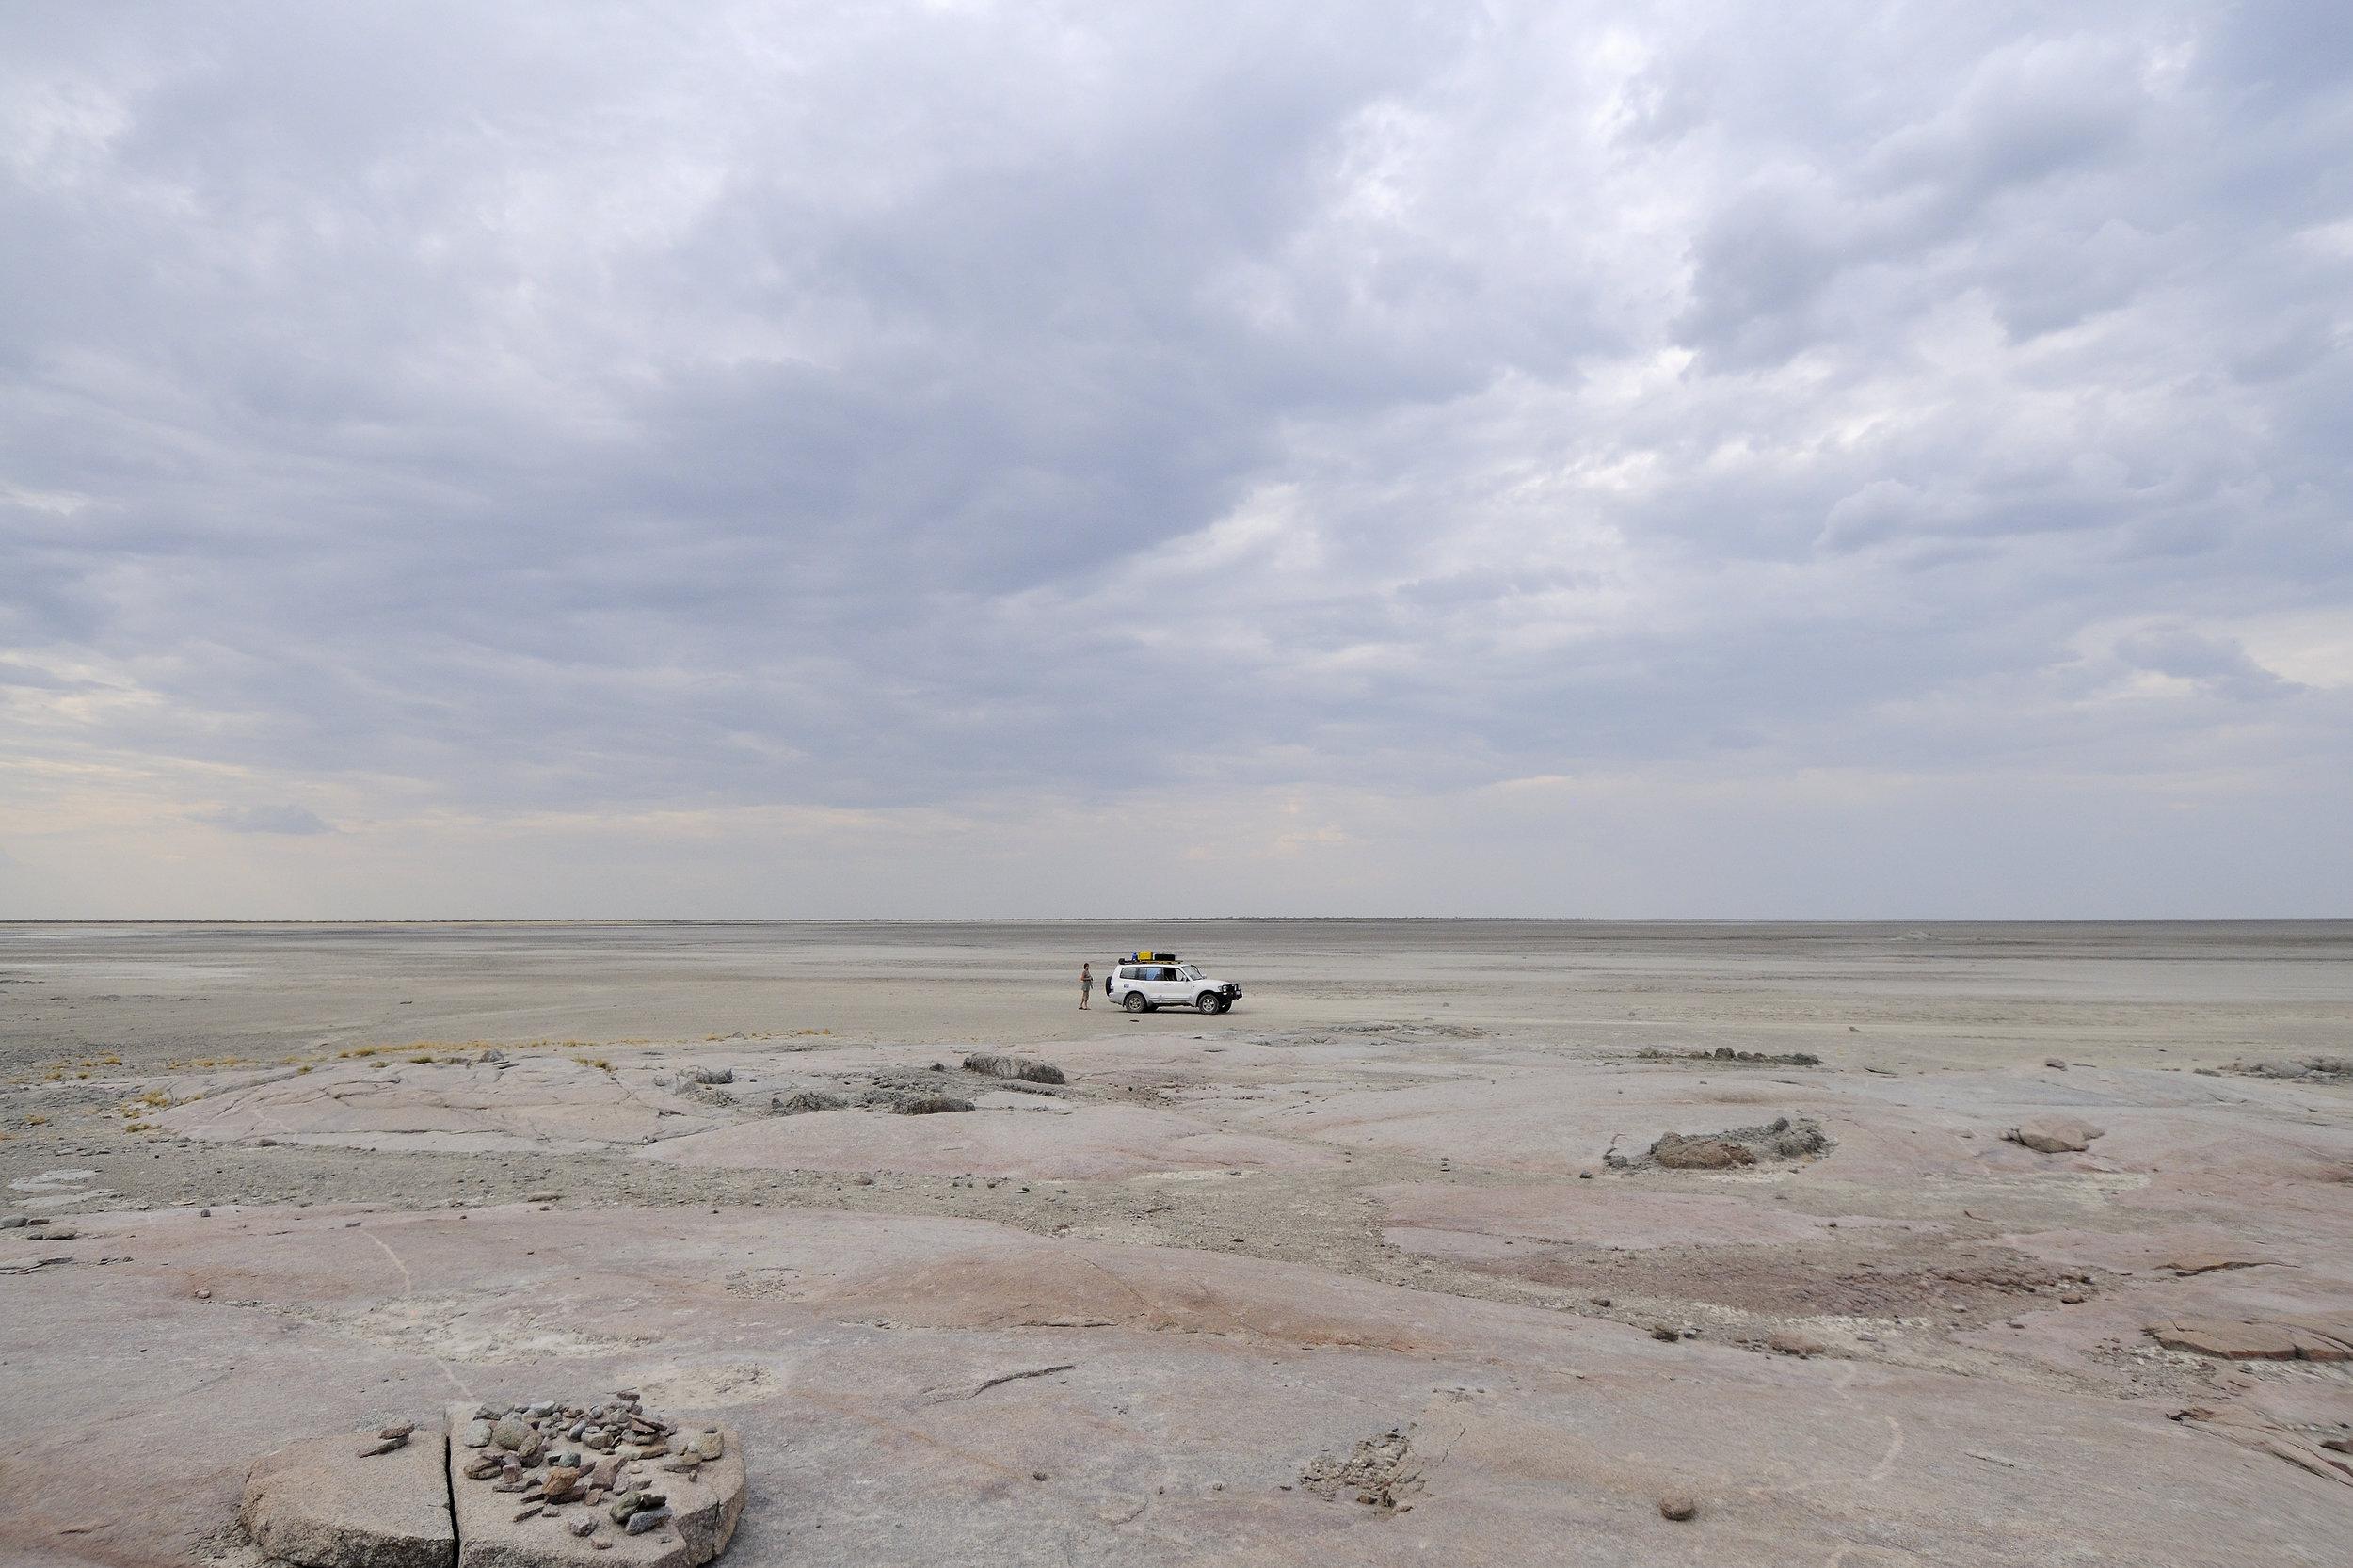 Makgadikgadi Salt Pans Photographed from Kubu Island in Botswana